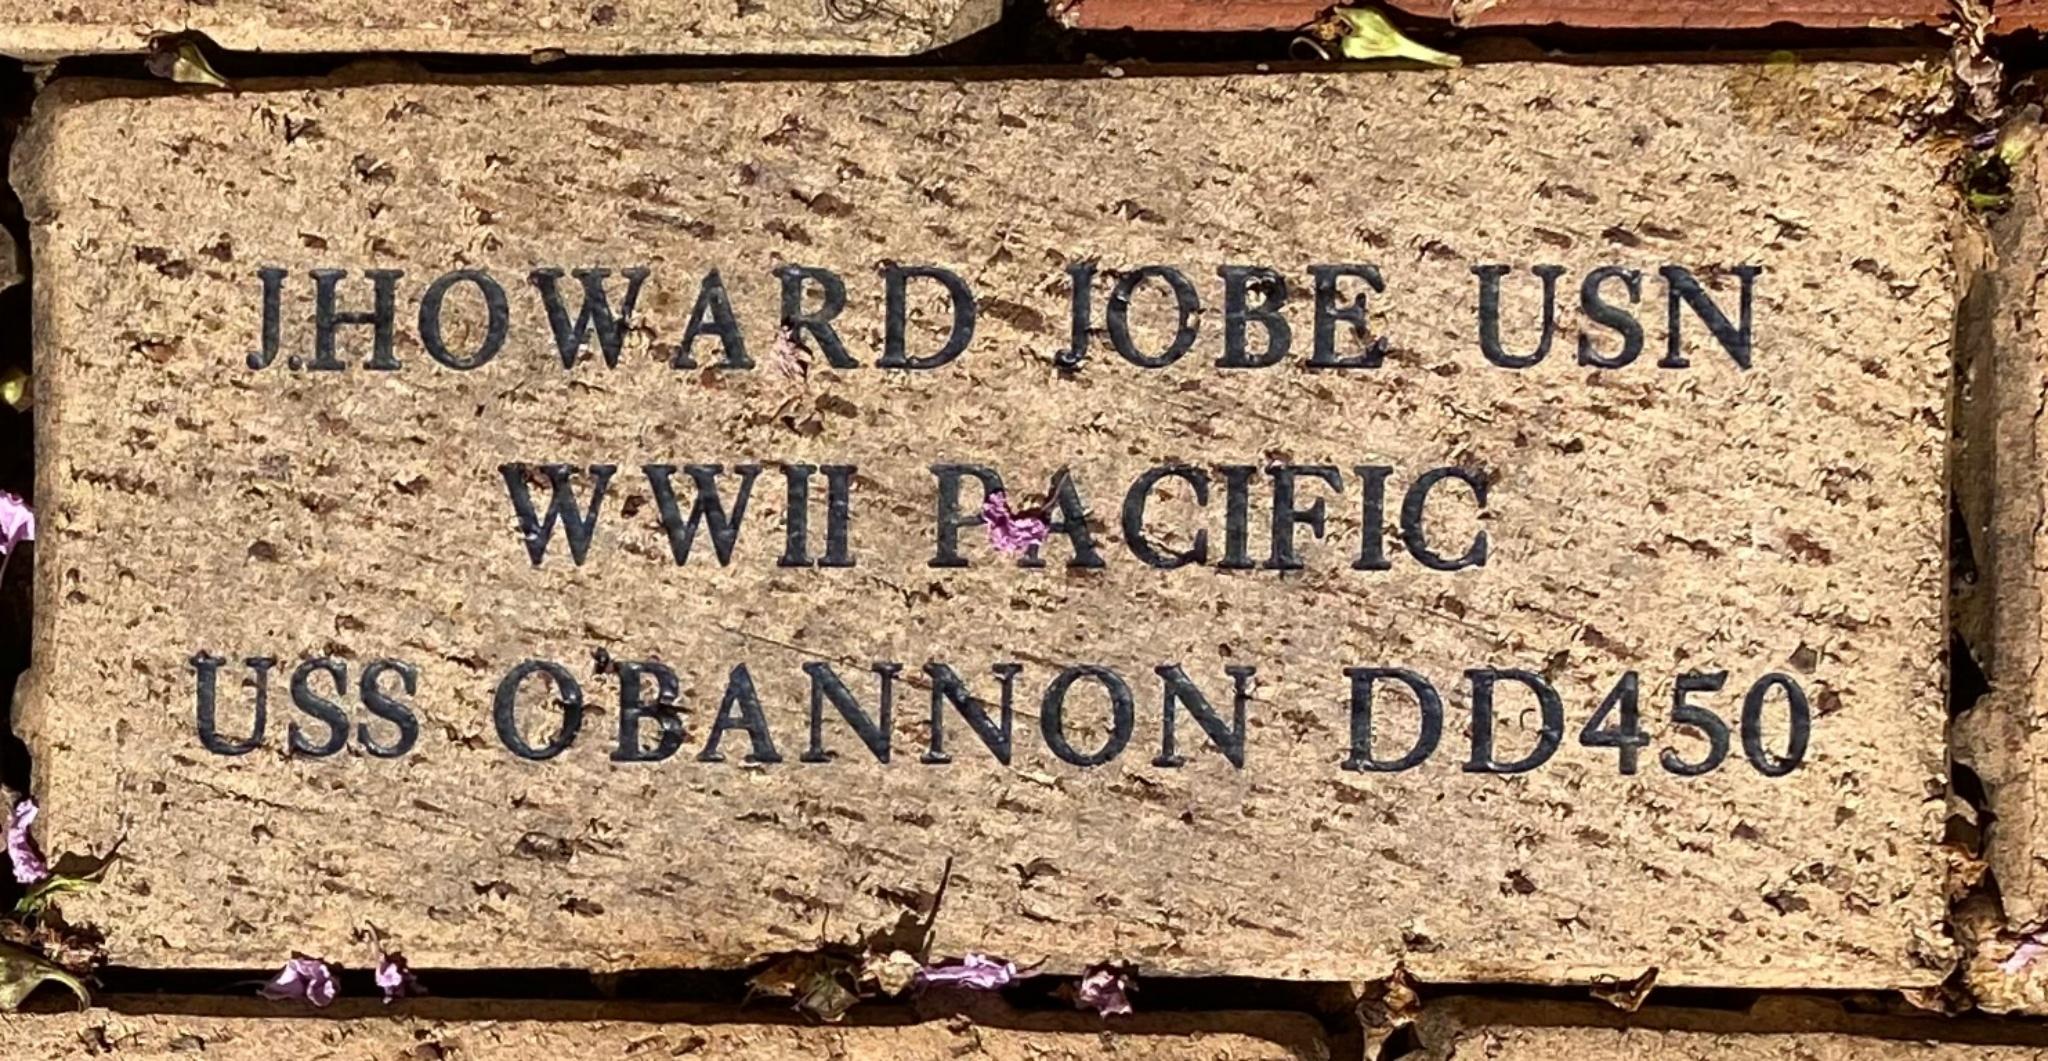 J.HOWARD JOBE USN WWII PACIFIC USS O'BANNON DD450